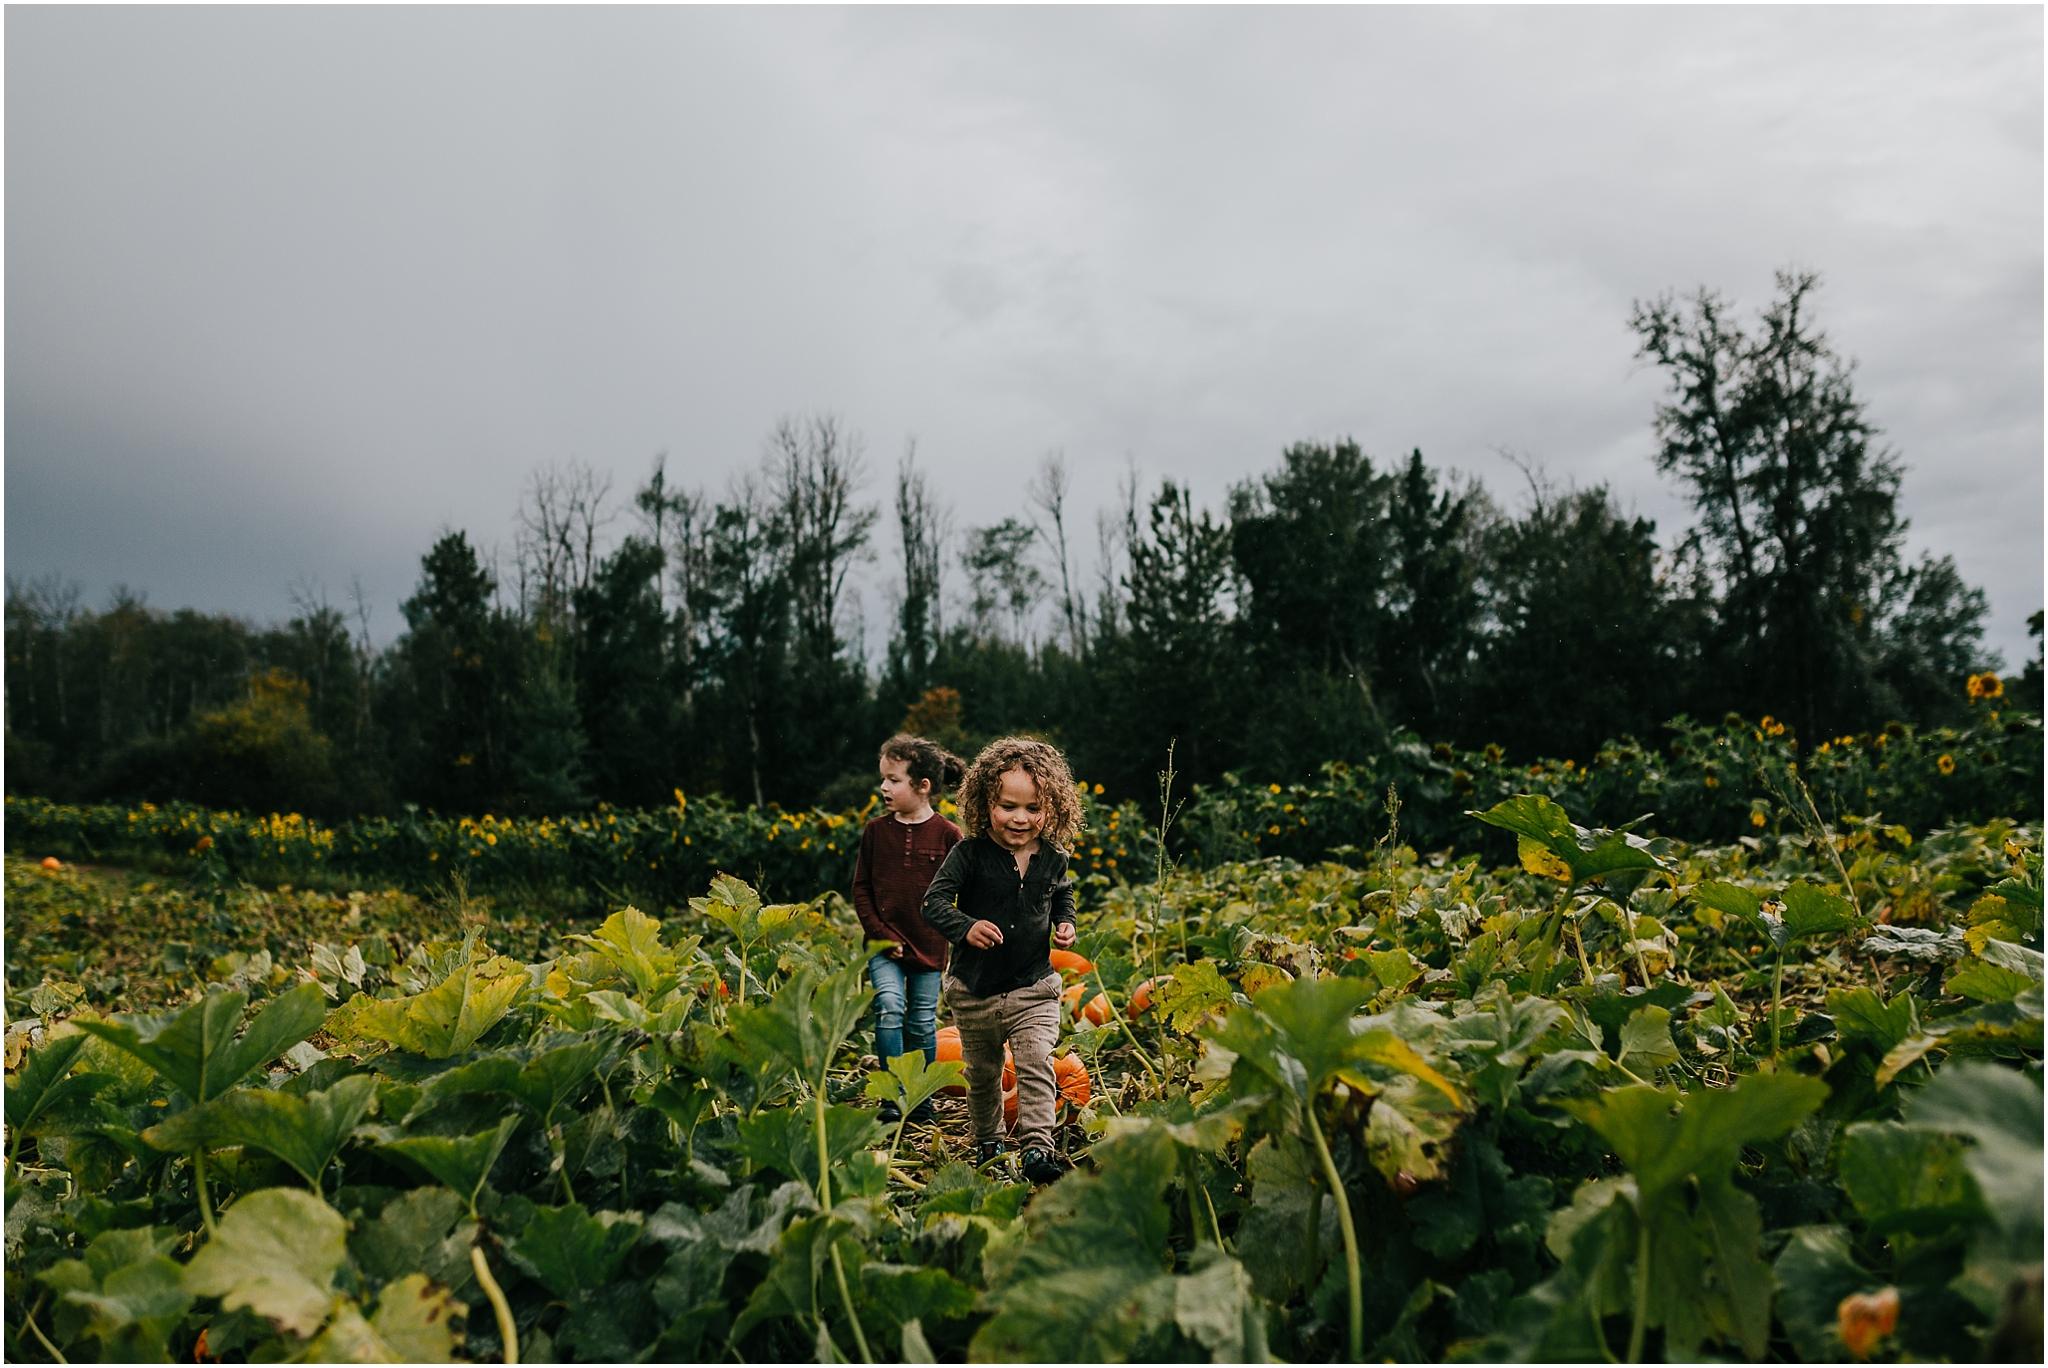 Edmonton Photographer - U-Pick Pumpkins - Treelines Photography - Somerset Farms